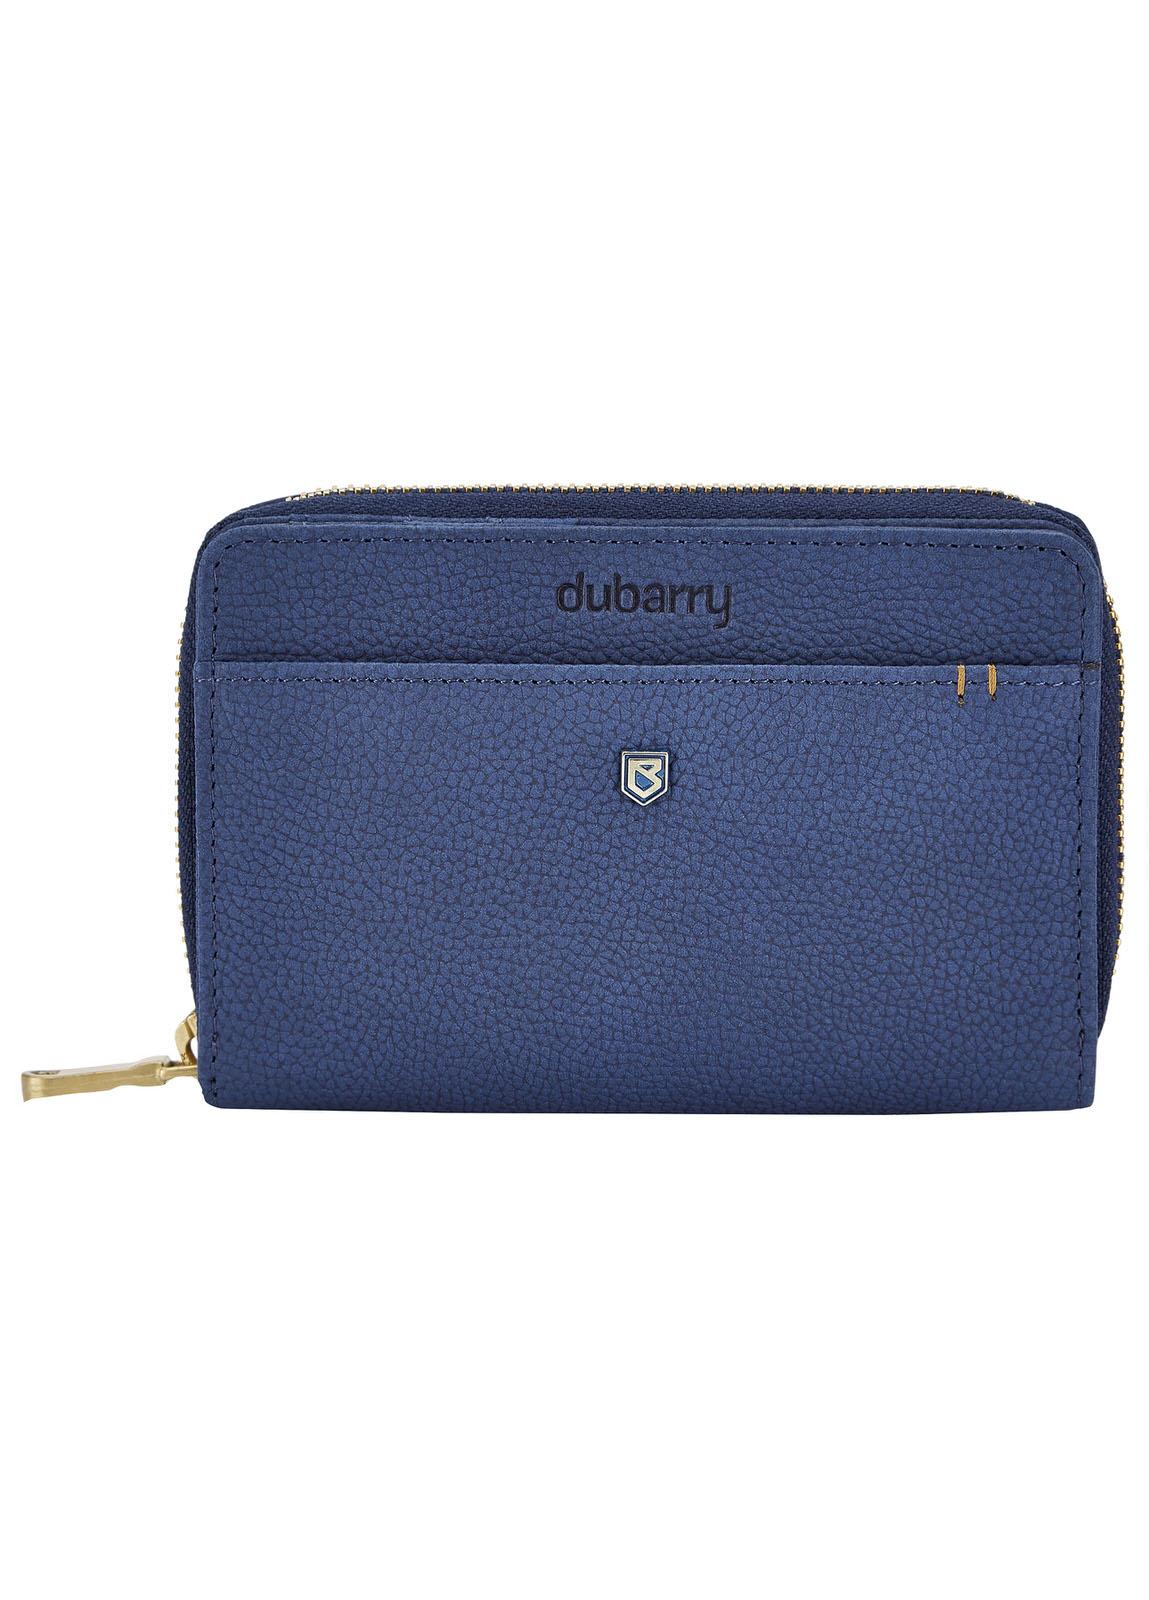 Portrush_Leather__Wallet_Royal_Blue_Image_1